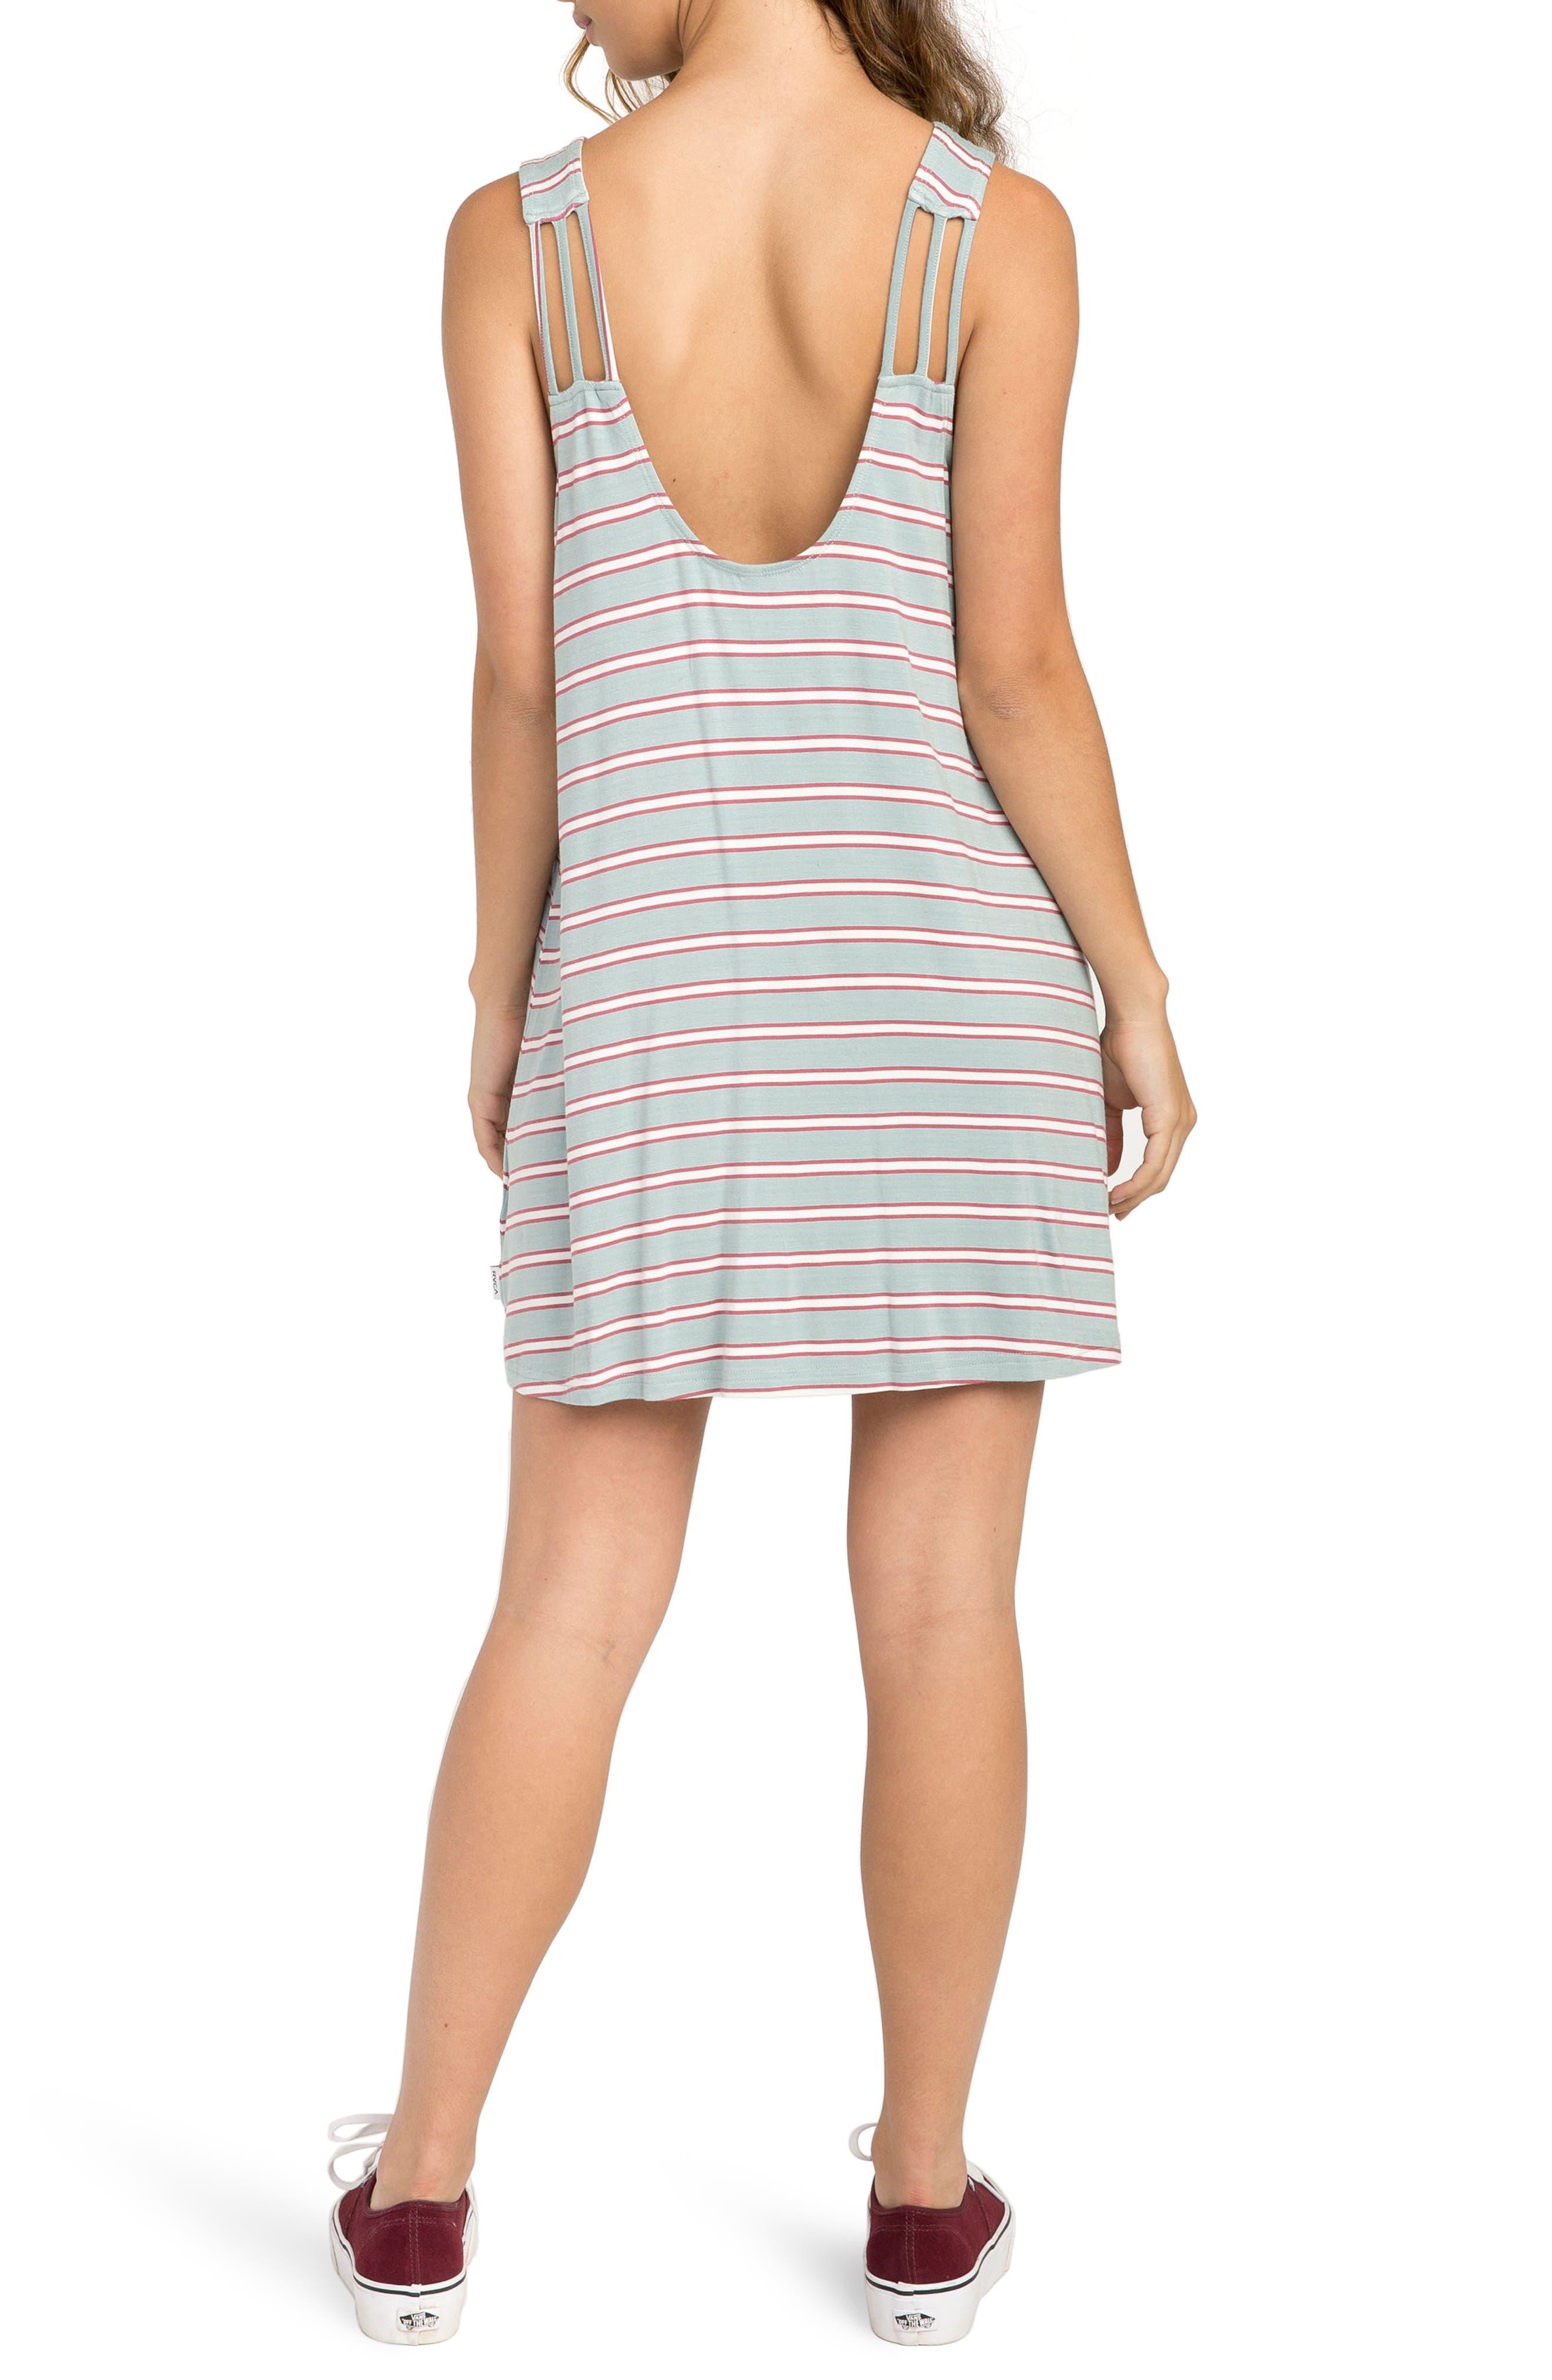 Lostlane Stripe Swing Dress,                             Alternate thumbnail 2, color,                             Cloud Blue